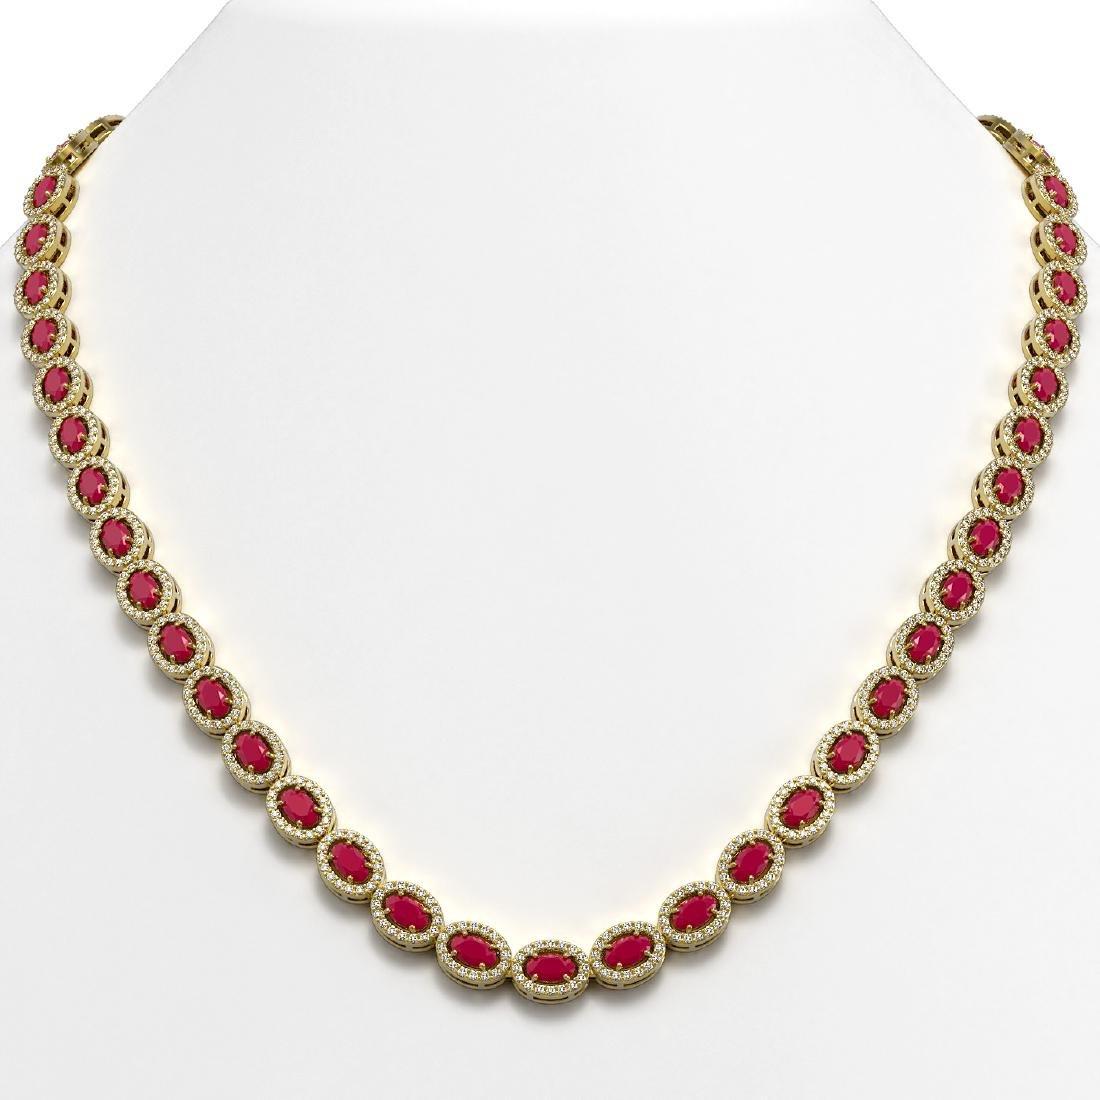 26.38 CTW Ruby & Diamond Halo Necklace 10K Yellow Gold